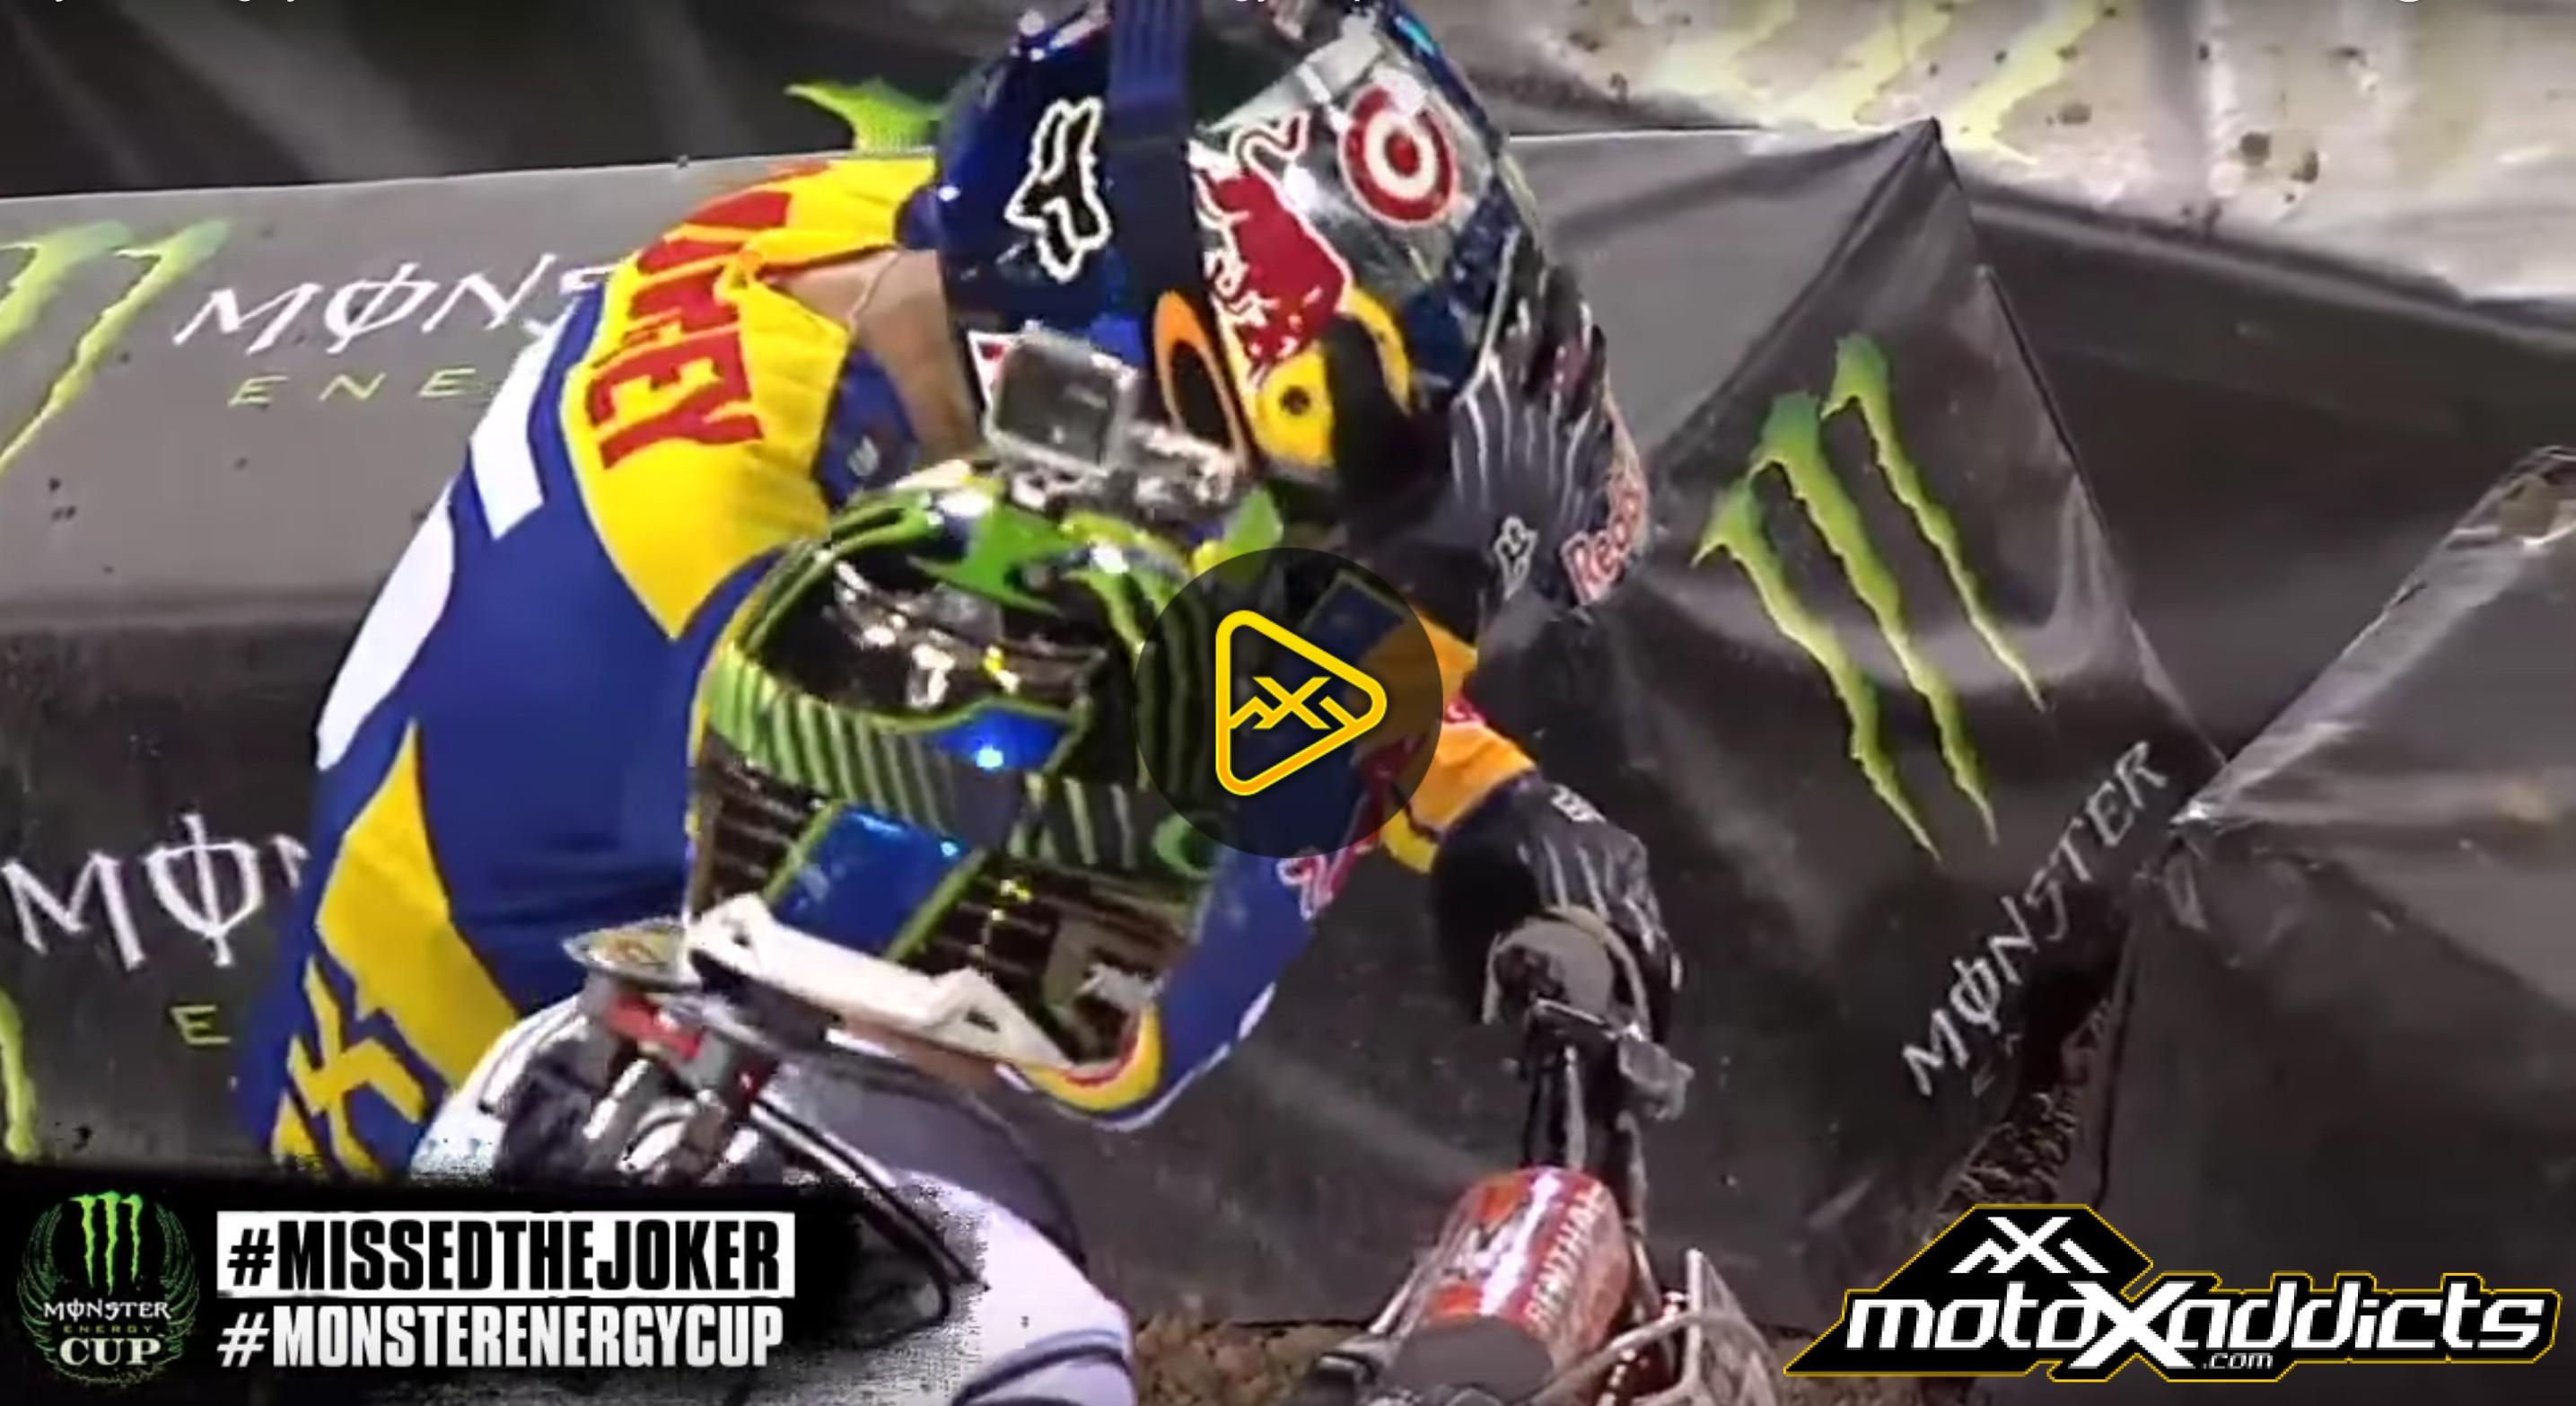 Flashback: Ryan Dungey Misses Joker Lane At 2013 Monster Cup